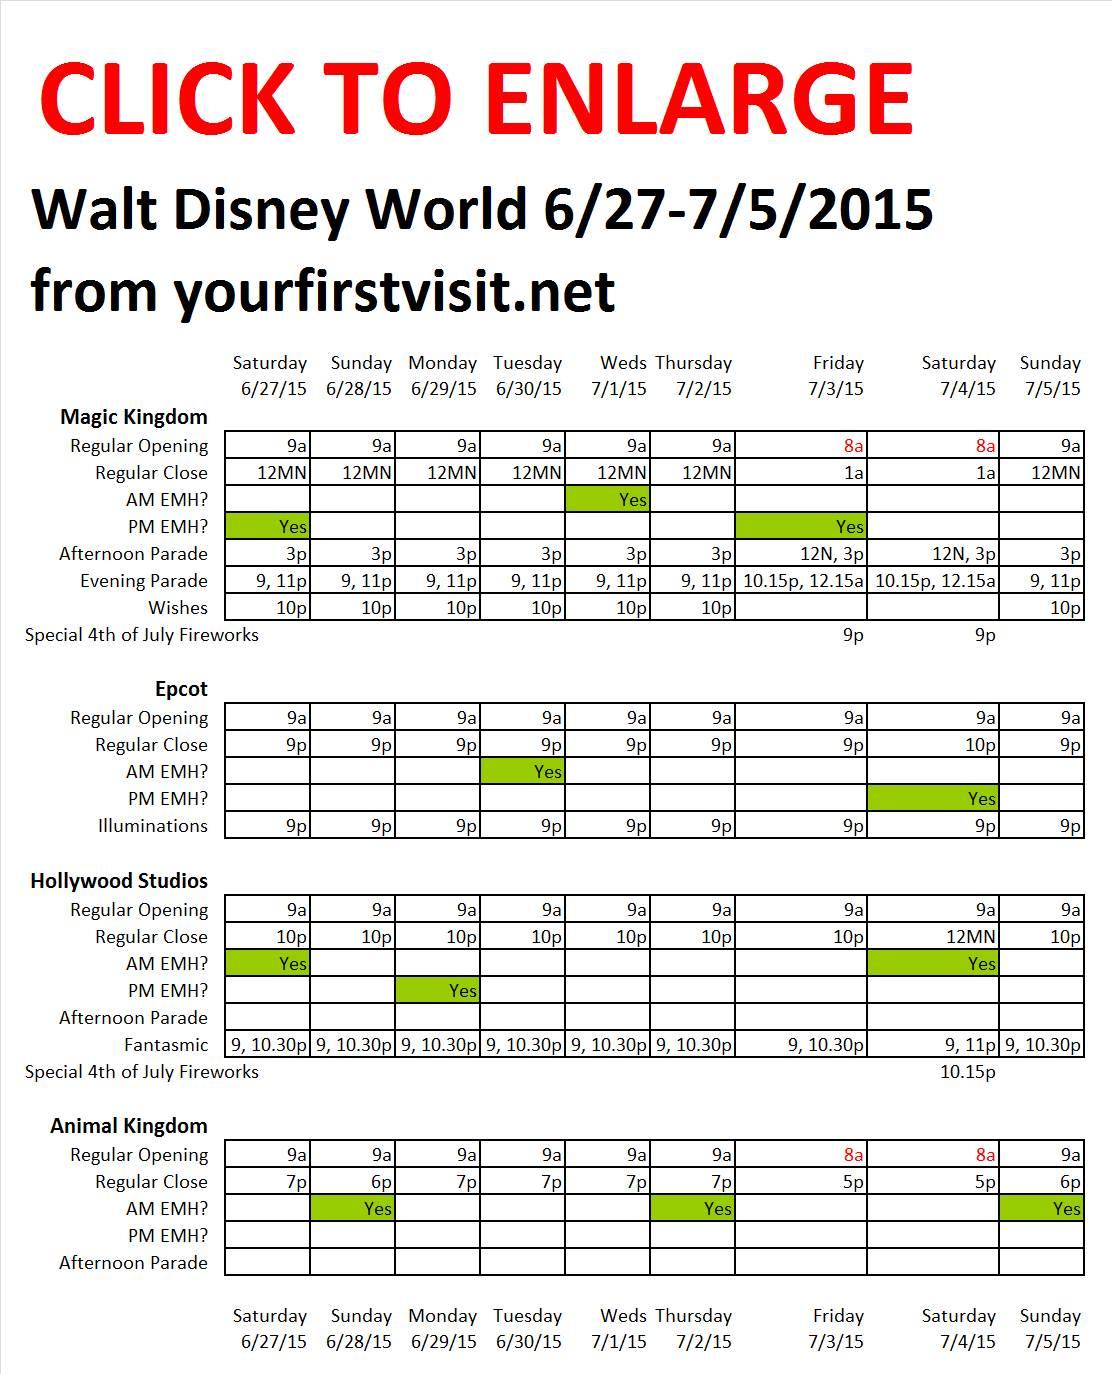 Disney World 6-27 to 7-5-2015 from yourfirstvisit.net